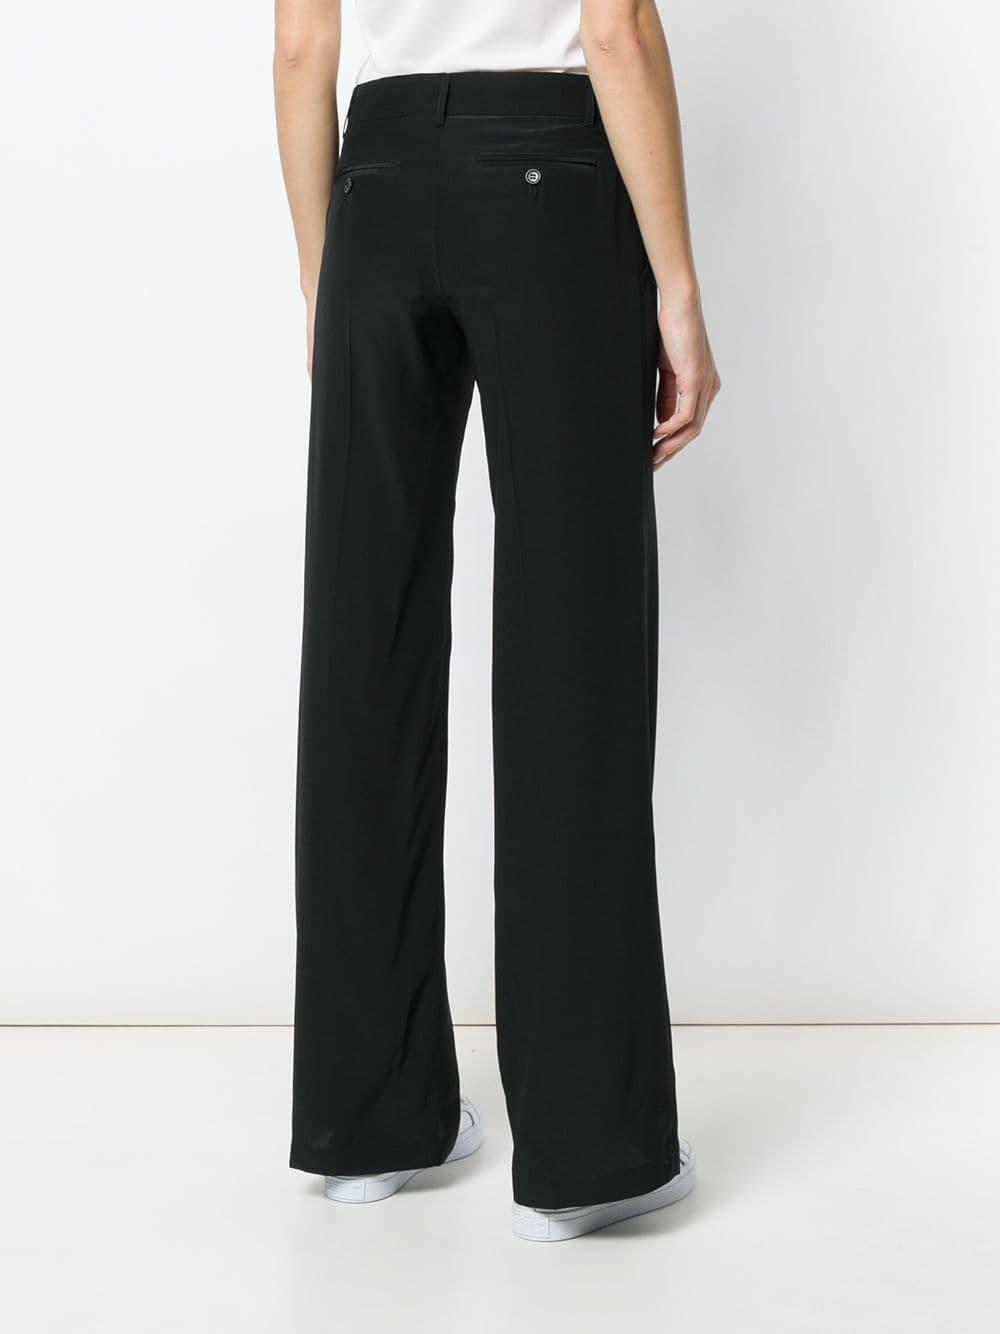 Pantaloni formali neri in seta a gamba dritta ASPESI | Pantaloni | H111 - B7535241